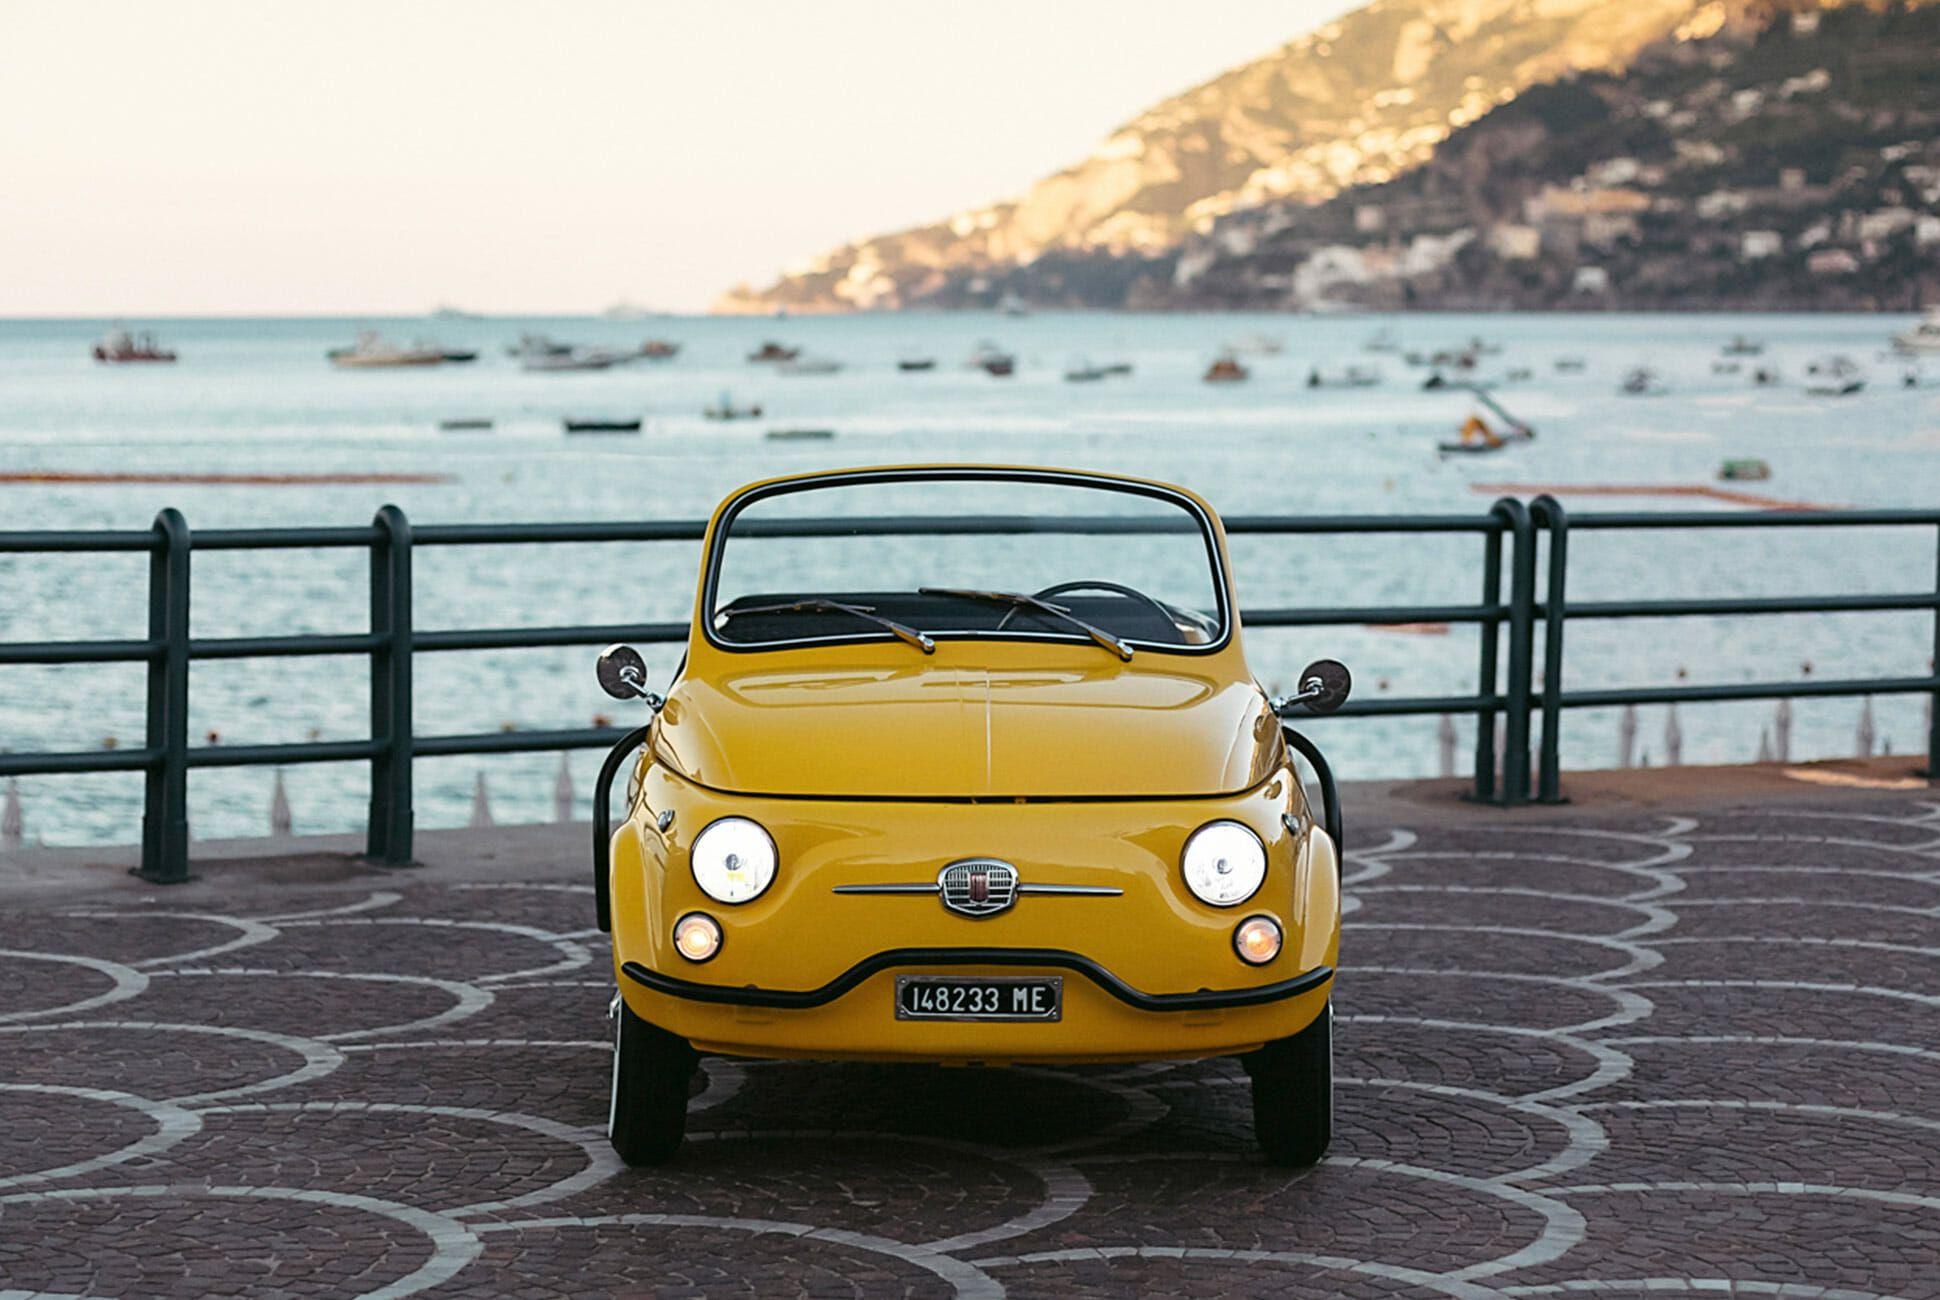 Fiat-Electric-Vehicles-gear-patrol-slide-2